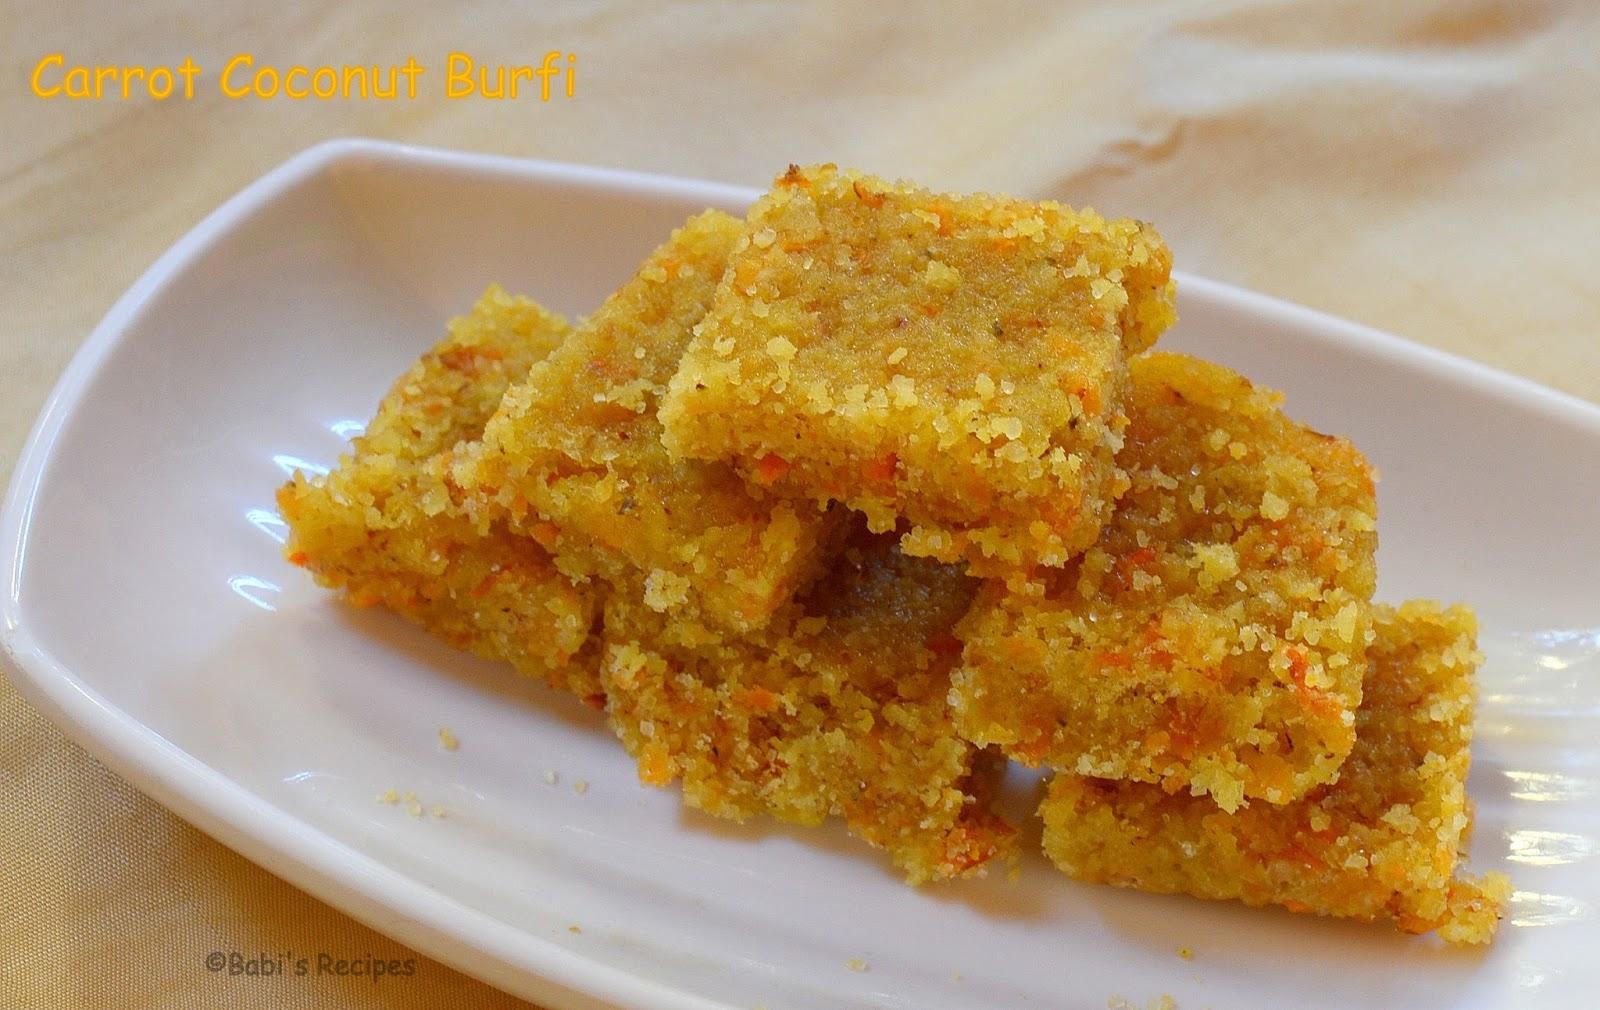 Babi s recipes carrot coconut burfi easy indian sweet recipe carrot coconut burfi easy indian sweet recipe video recipe forumfinder Images